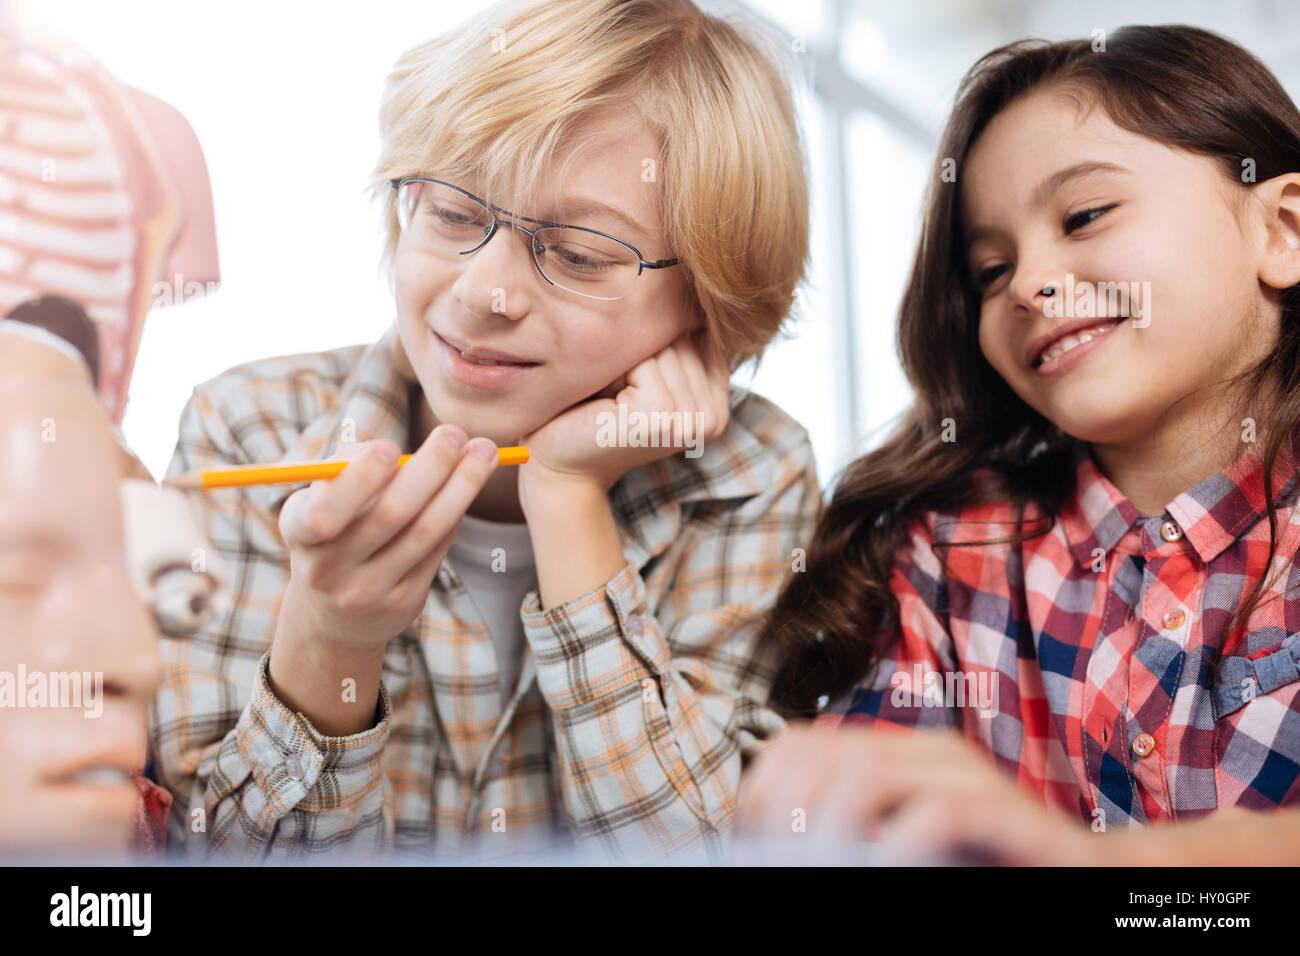 Enthusiastic children studying human anatomy - Stock Image